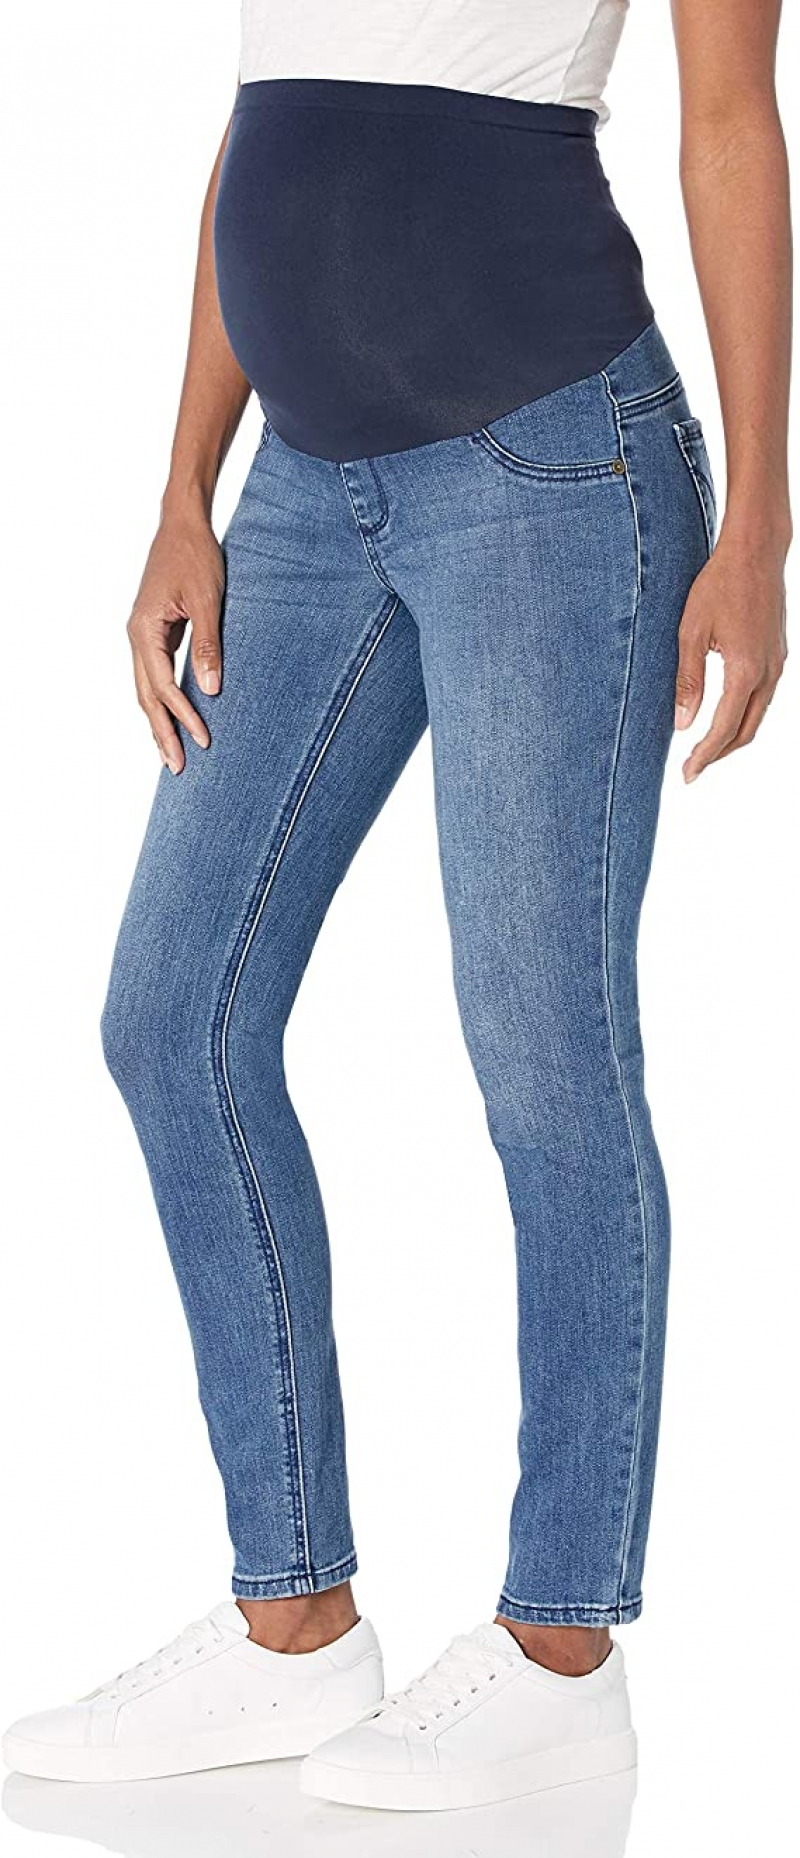 ihocon: Motherhood Maternity Women's Maternity Indigo Blue Super Stretch Secret Fit Belly Skinny Denim Jean 孕產牛仔褲